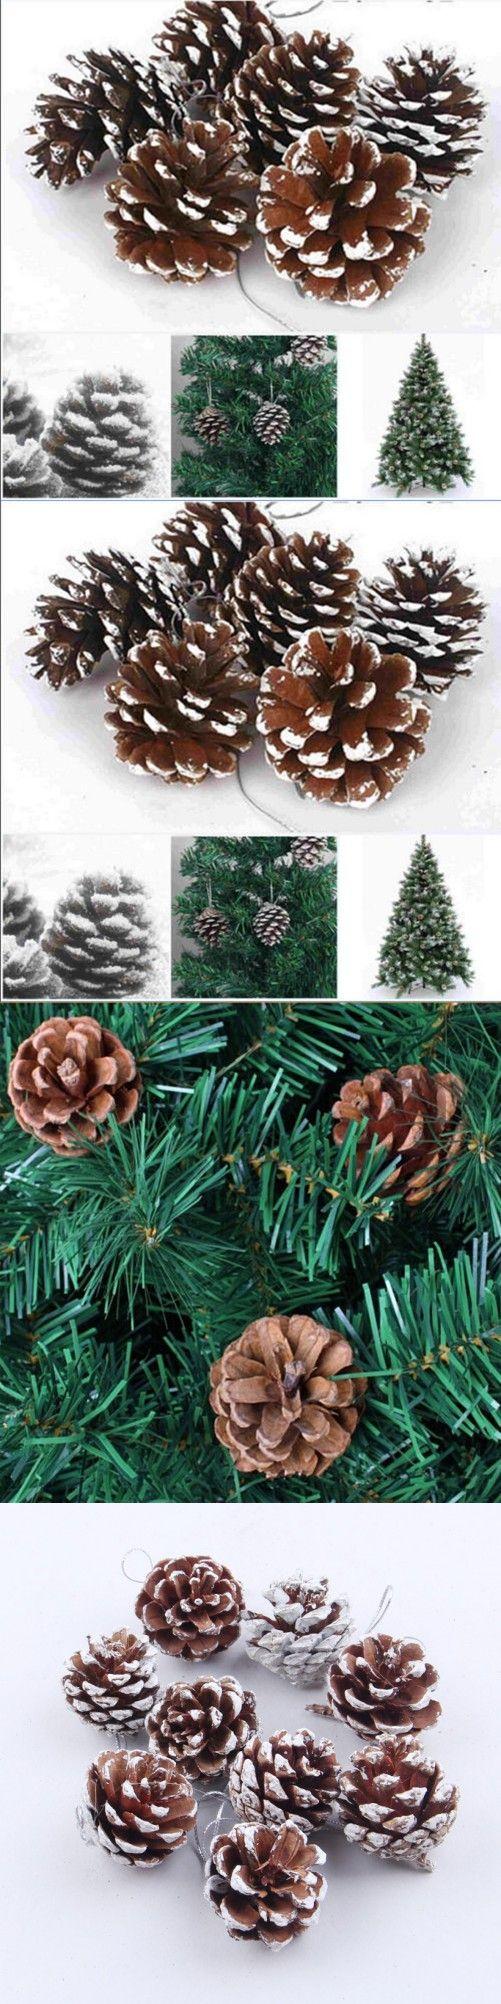 Best 10 Christmas decorations wholesale ideas on Pinterest Buy